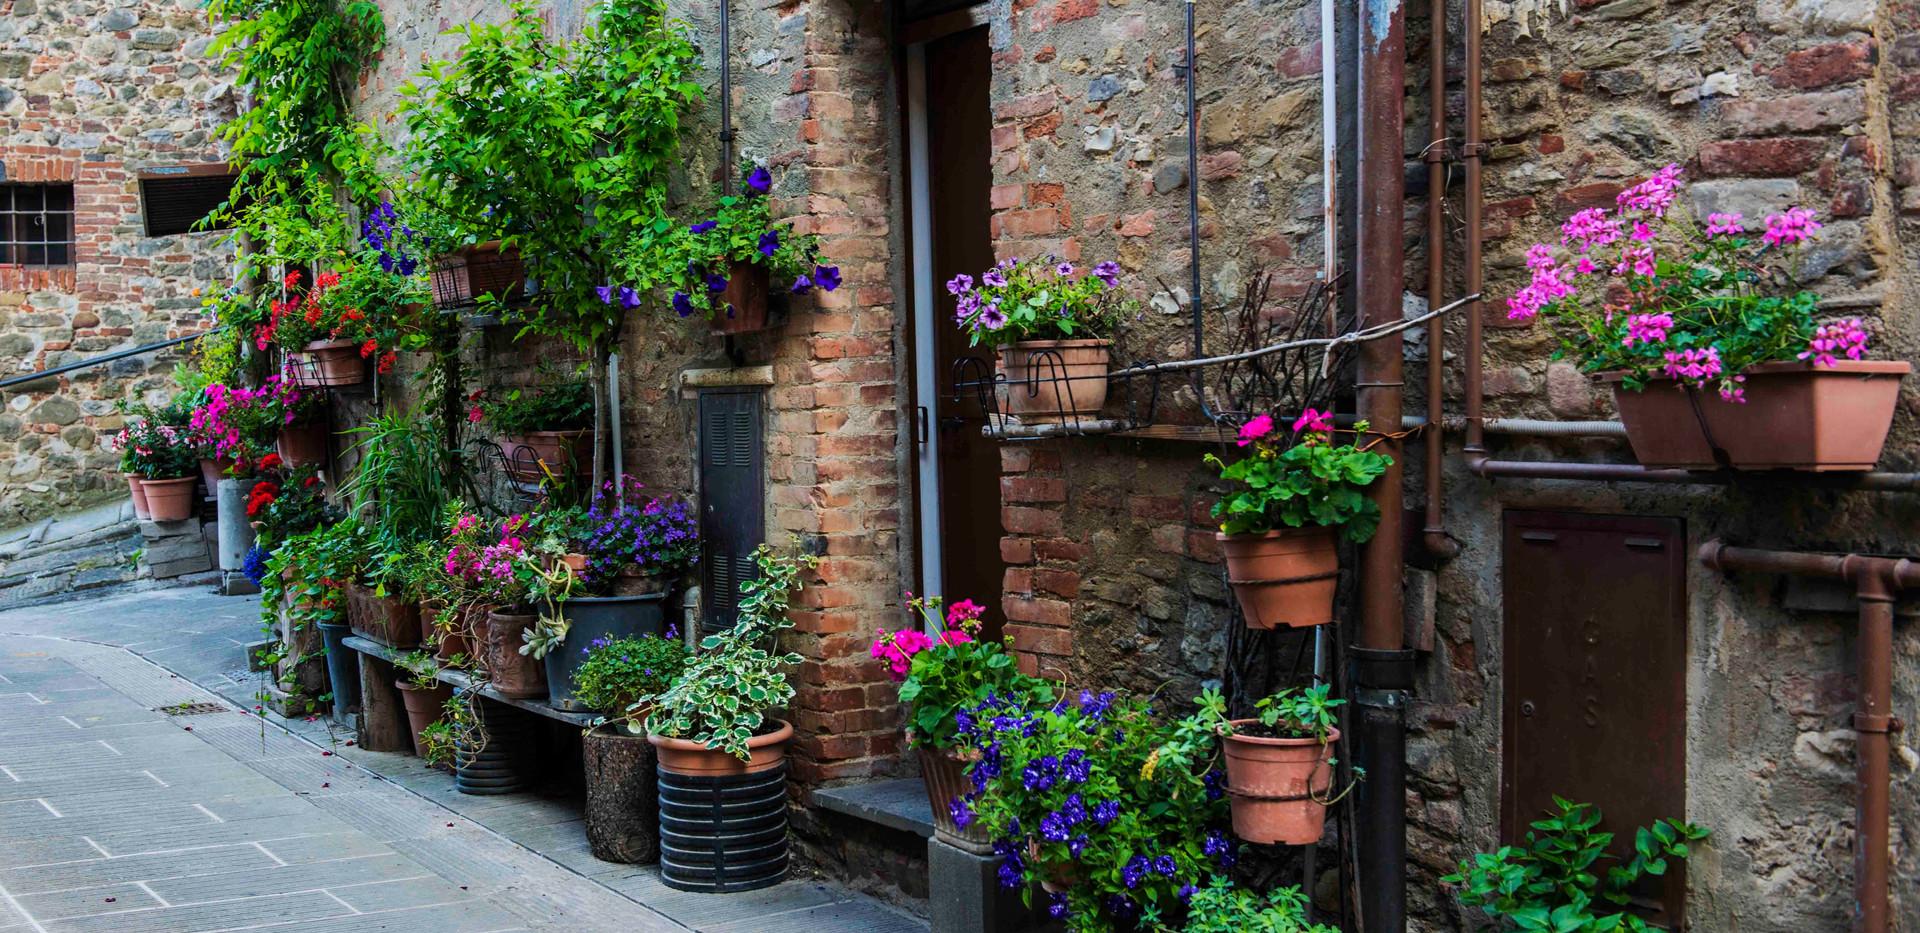 Piegaro Street scene